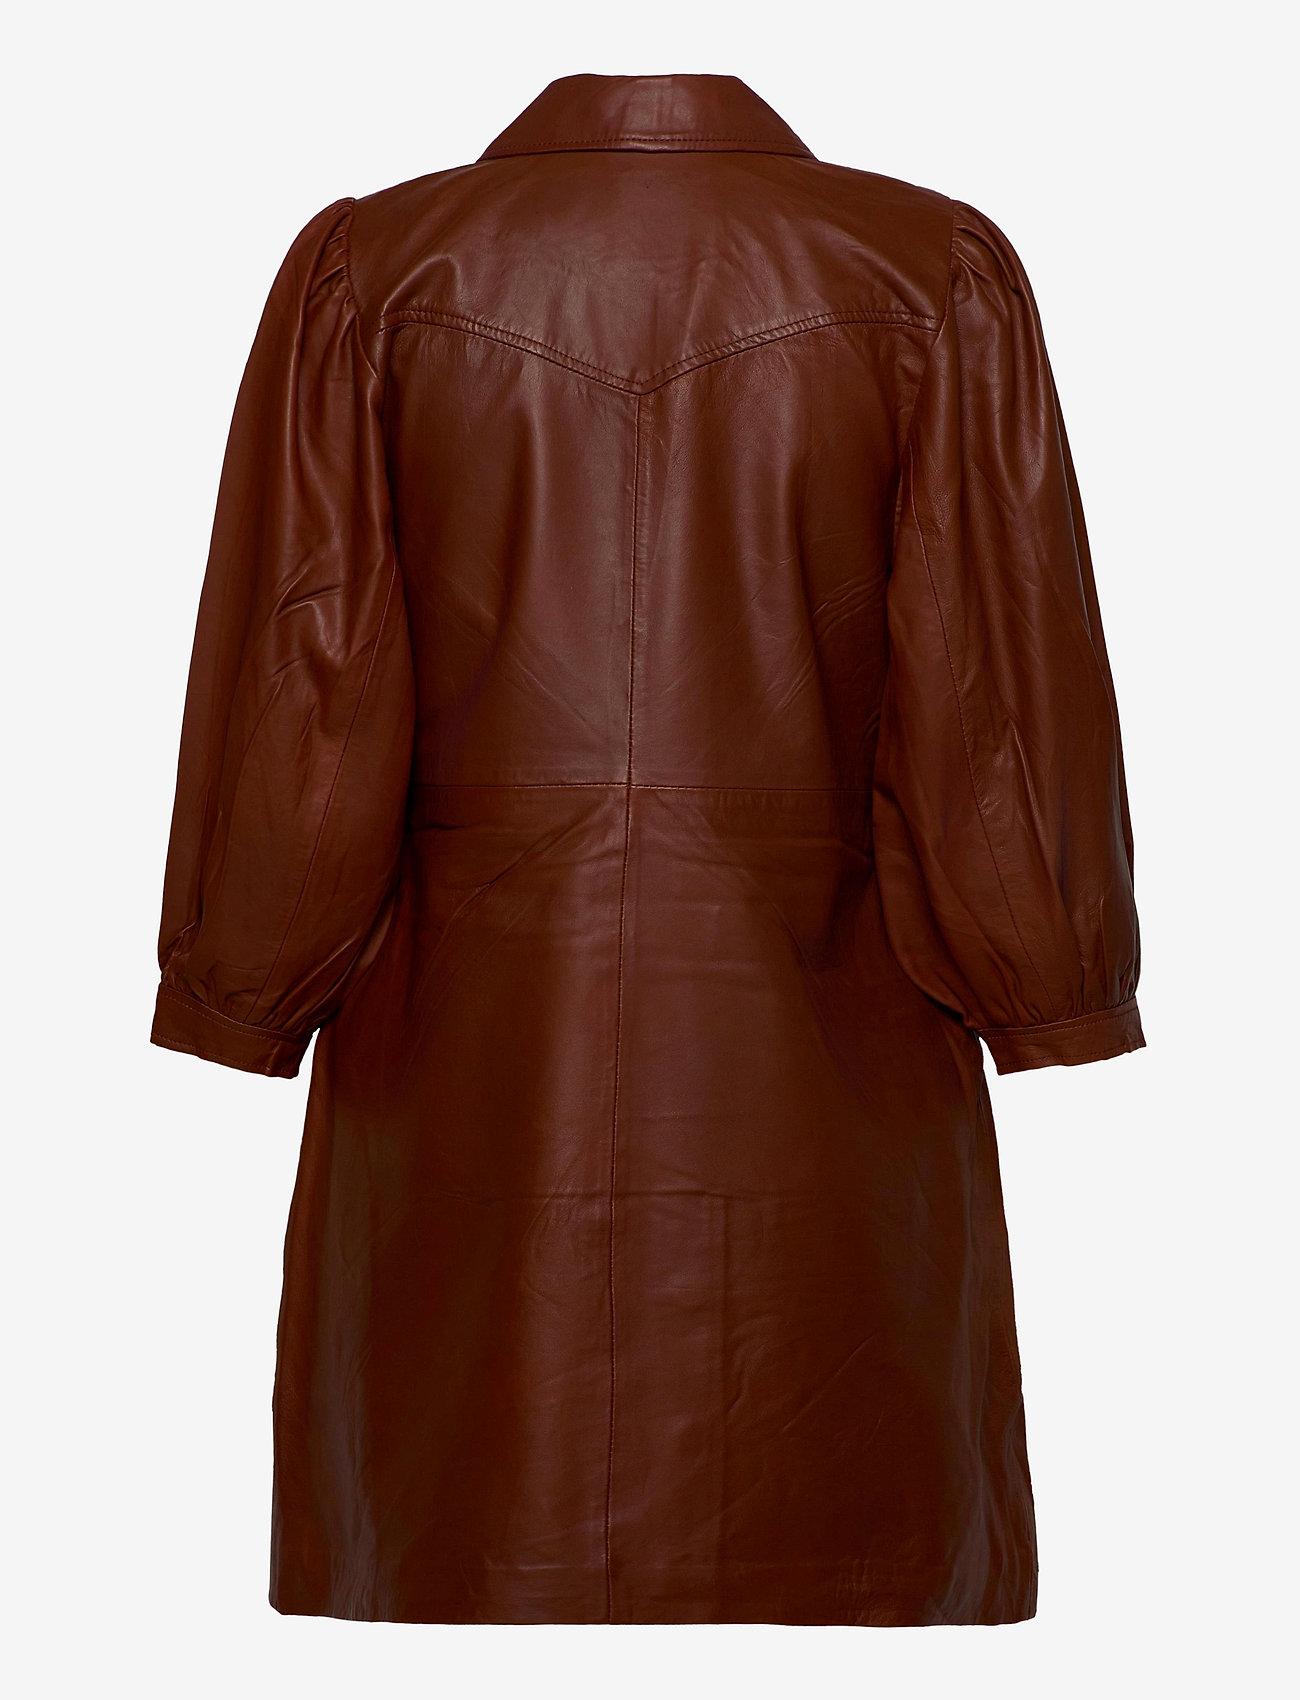 Amilie   - mbyM -  Women's Dresses Clearance